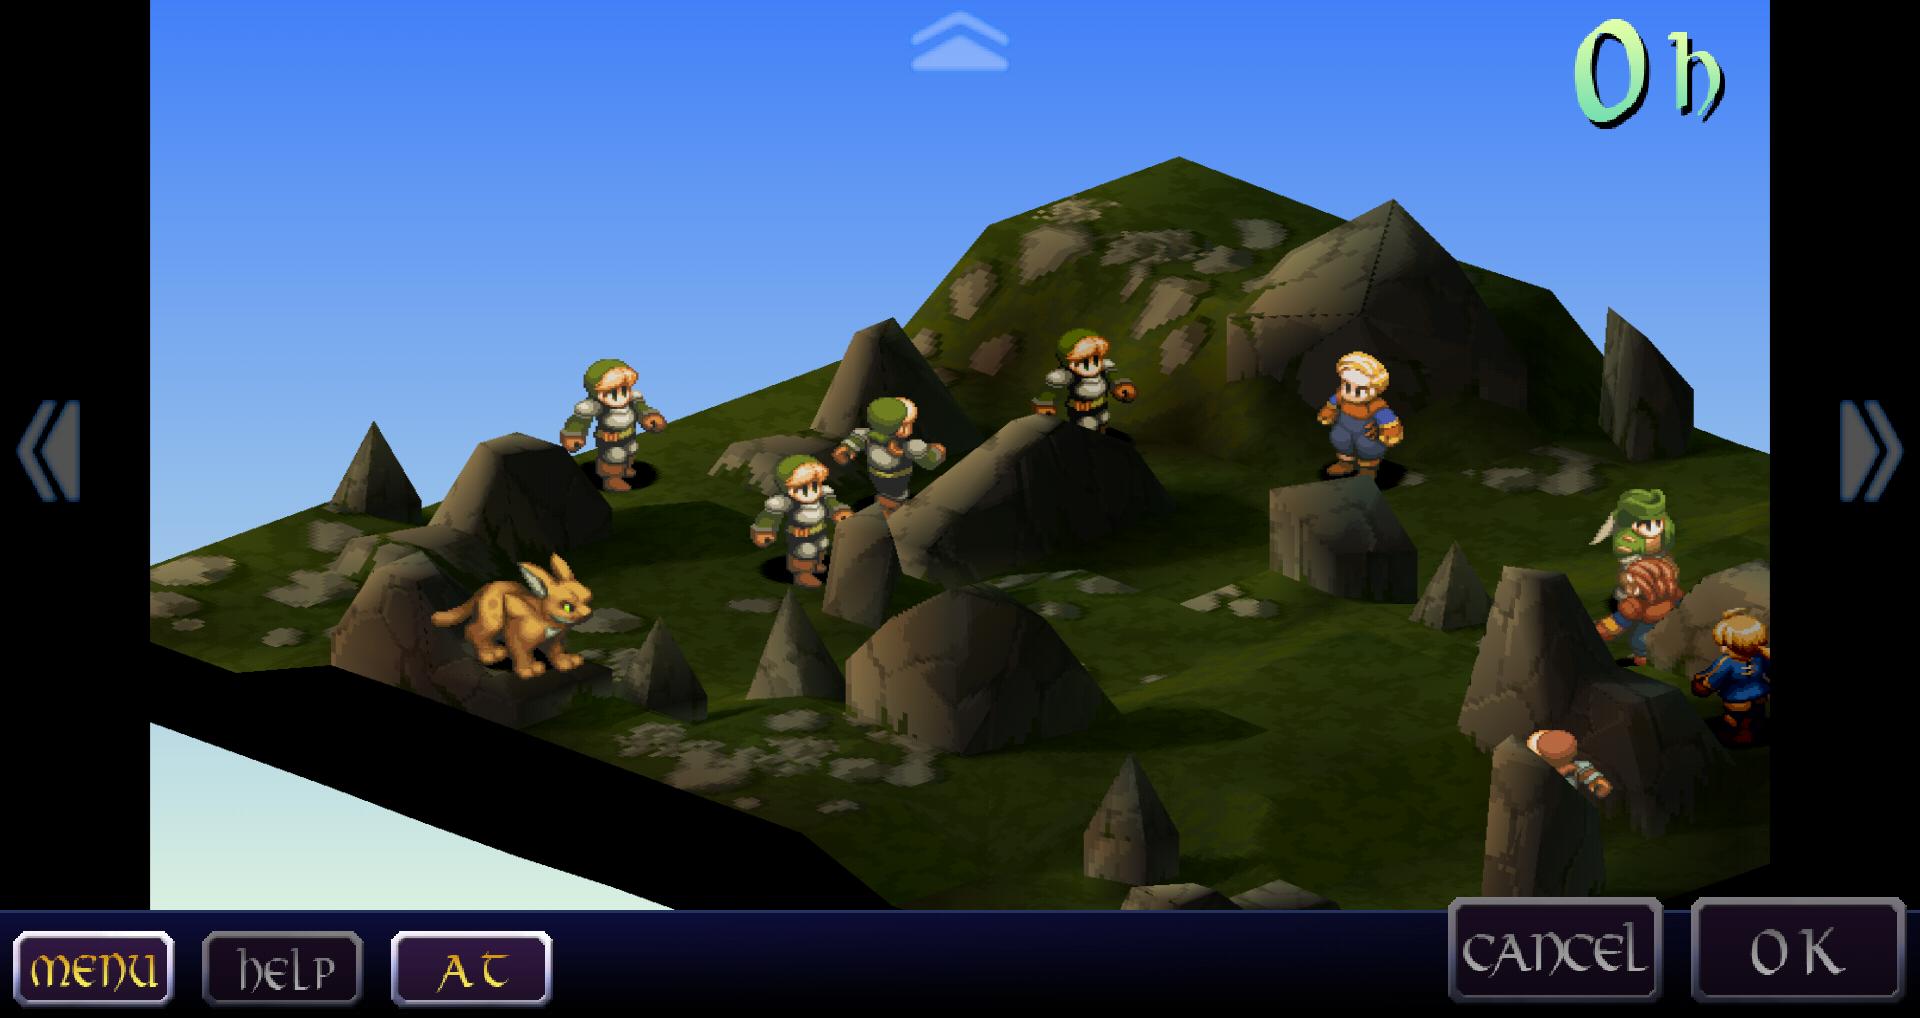 FINAL FANTASY TACTICS 獅子戦争 androidアプリスクリーンショット2